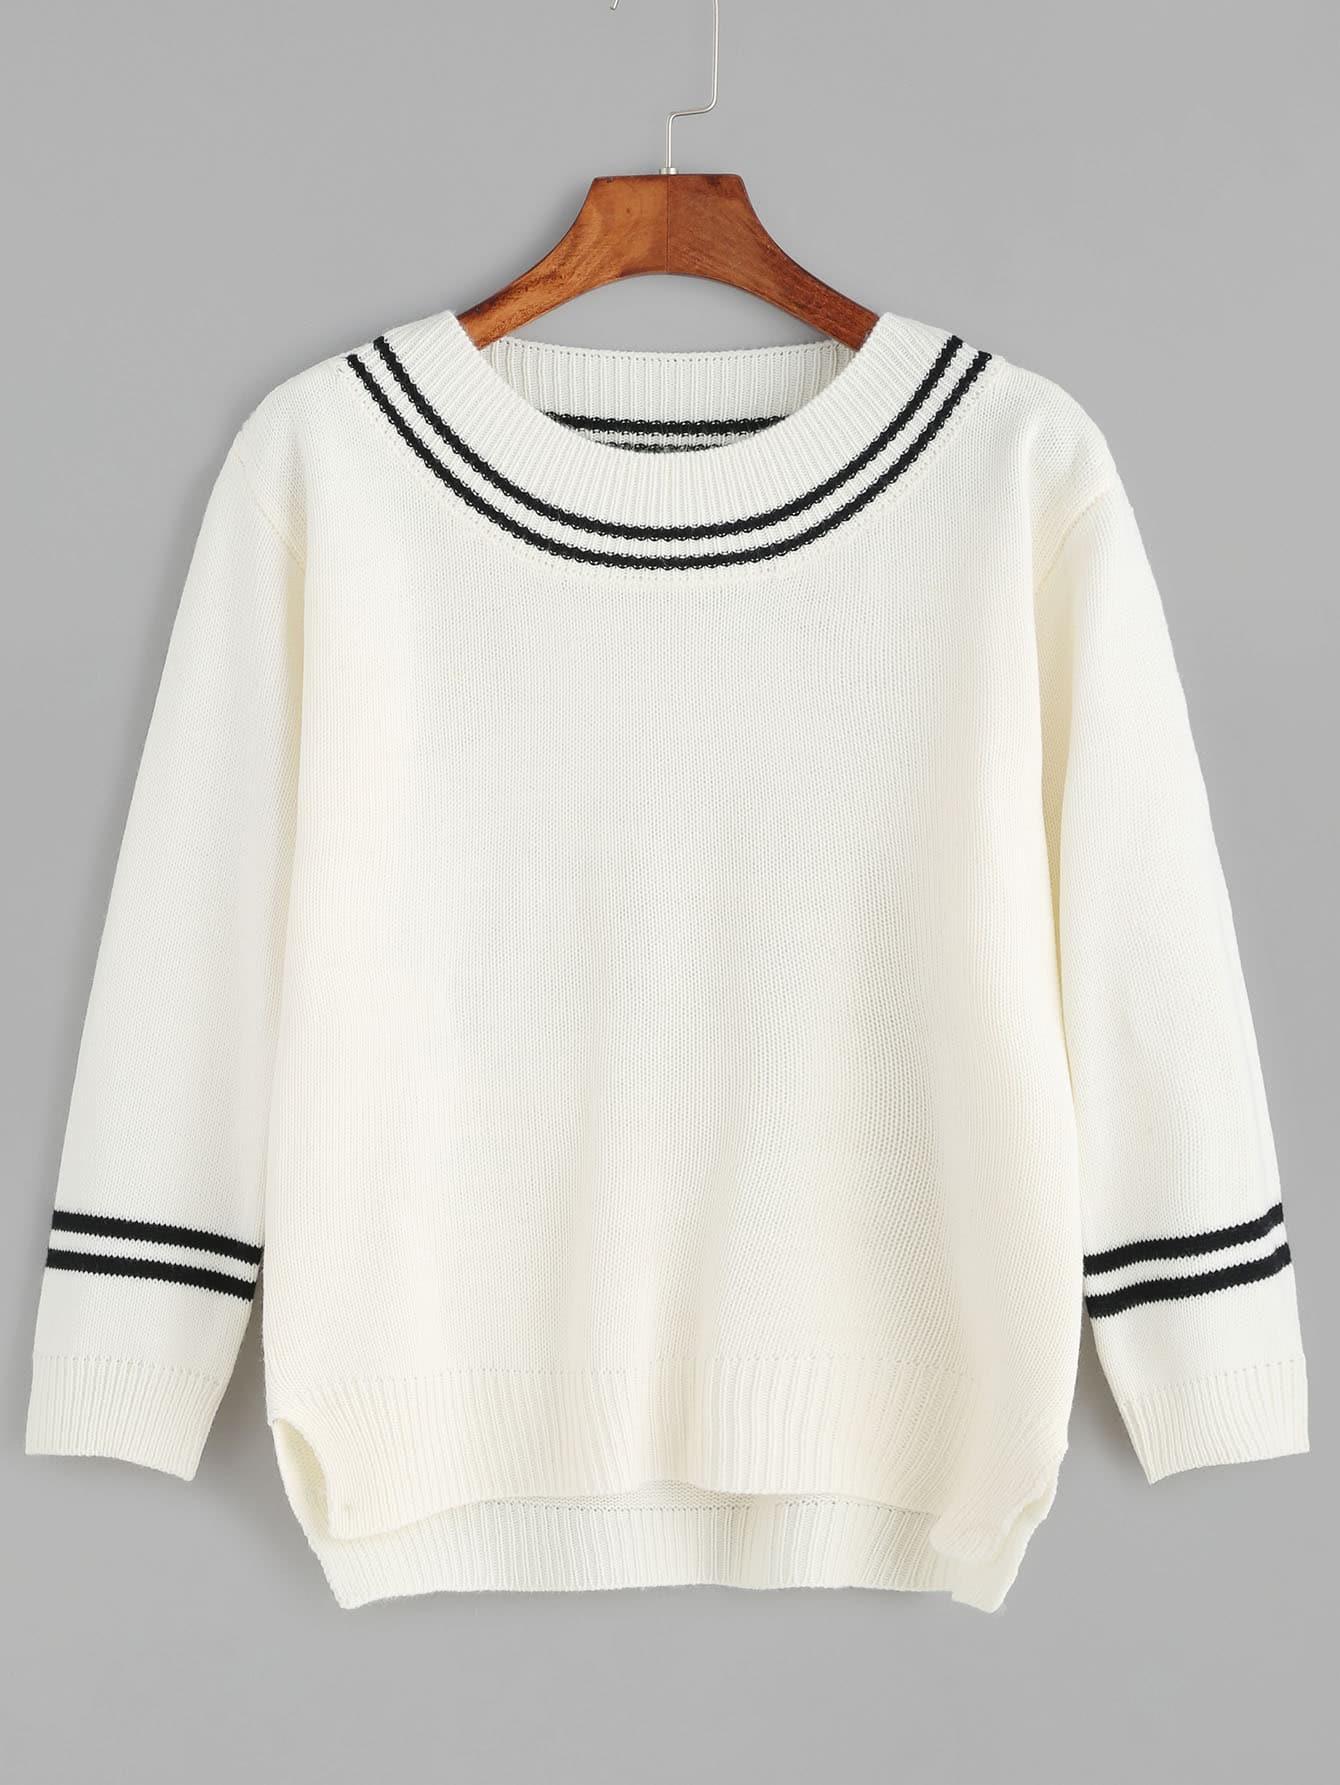 Beige Striped Trim Slit Side High Low Sweater sweater161025102